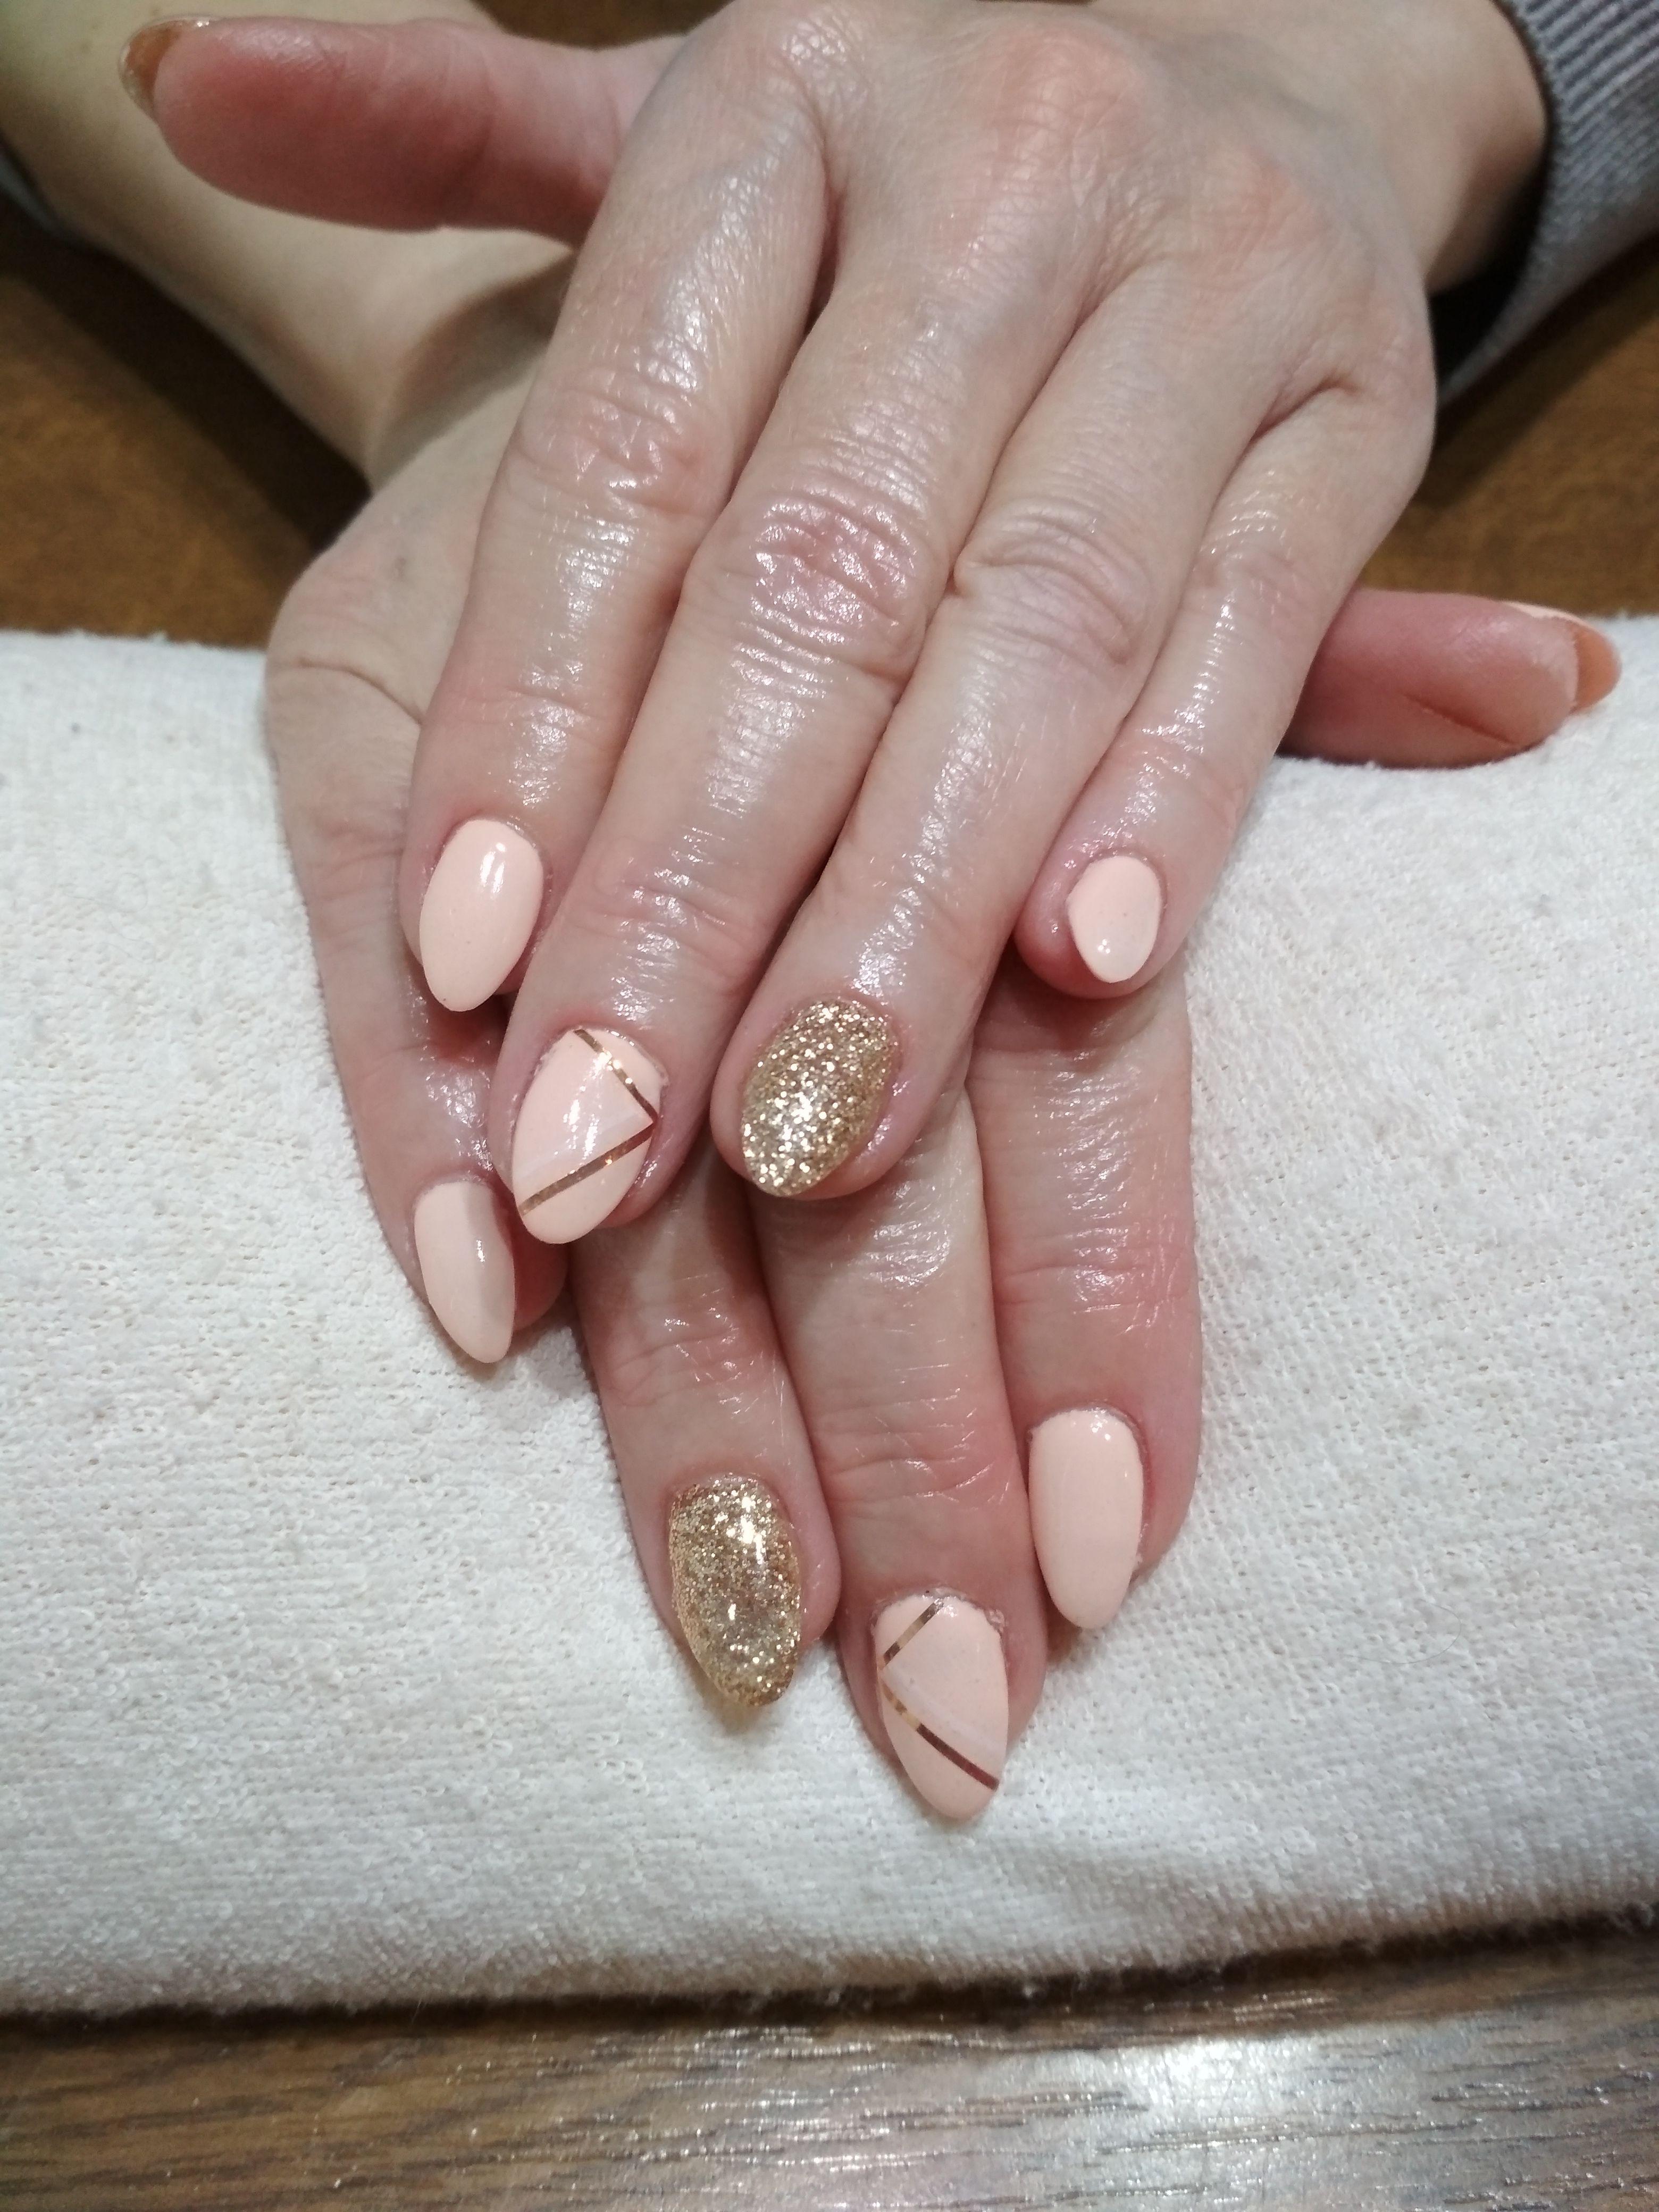 Beige Nails Beige Color Beige Gel Gold Glitter Gold Stripes Gelove Nehty Nehty